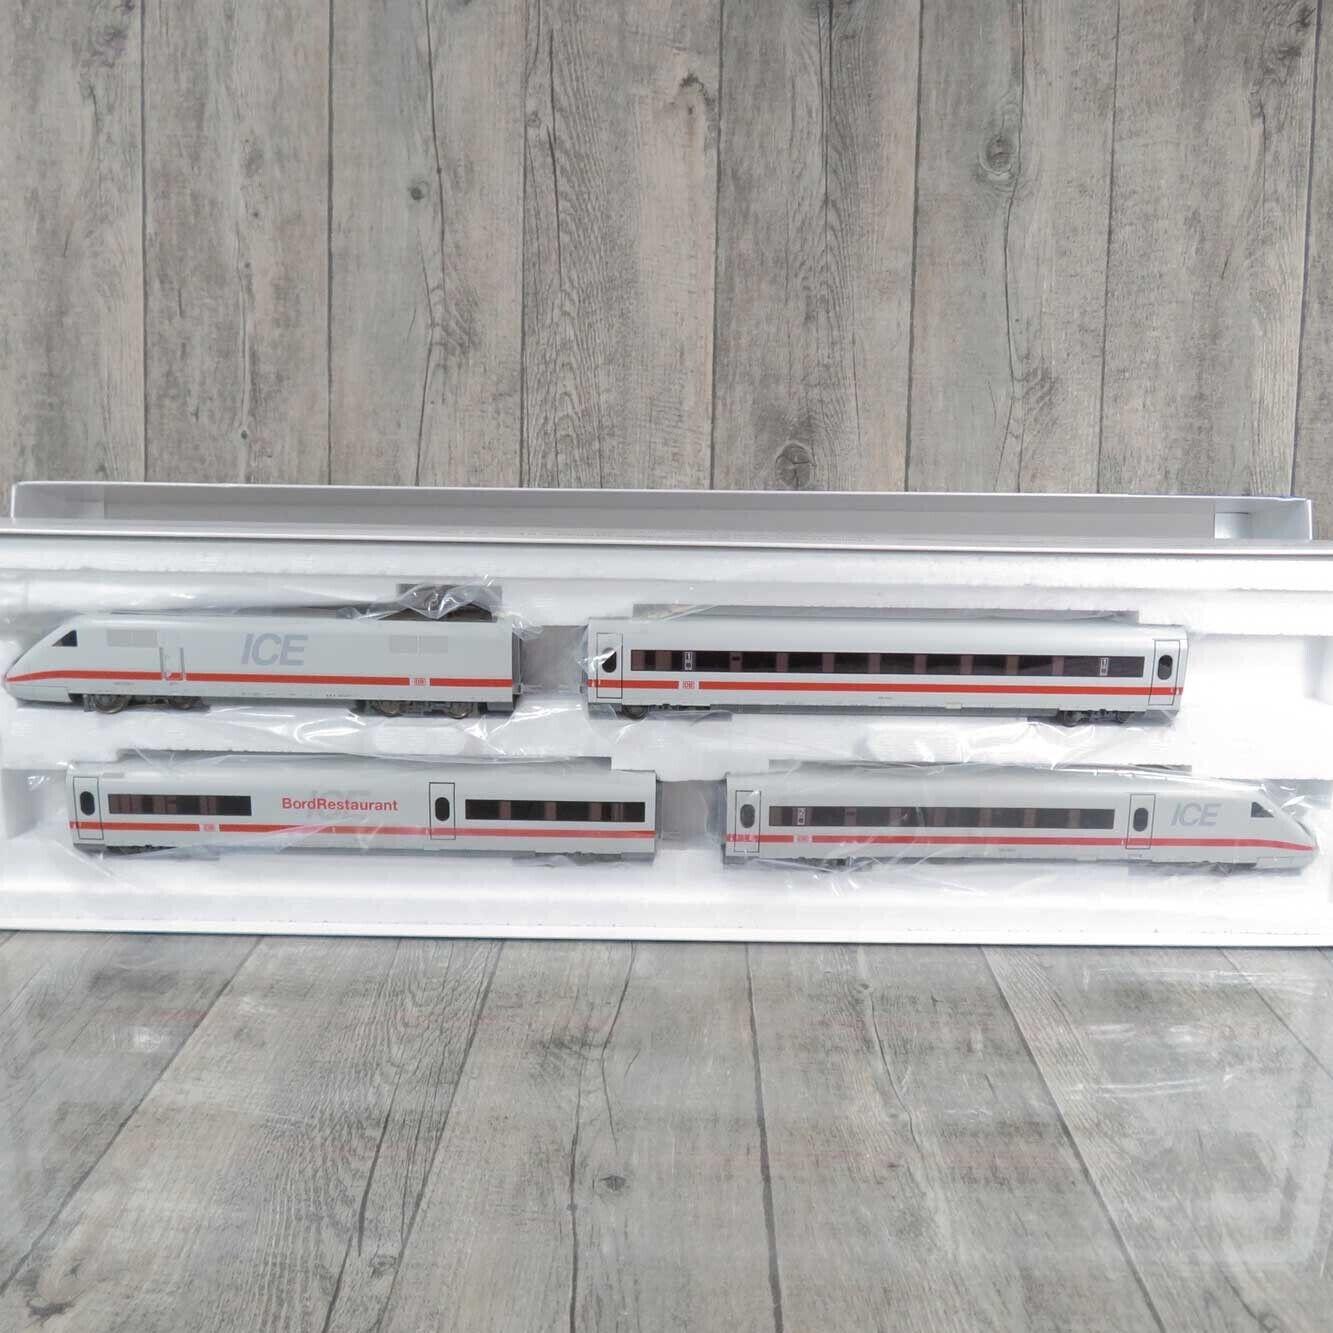 MÄRKLIN 36712 - HO - Hochgeschwindigkeitszug ICE 2 - digital - OVP -  C28694